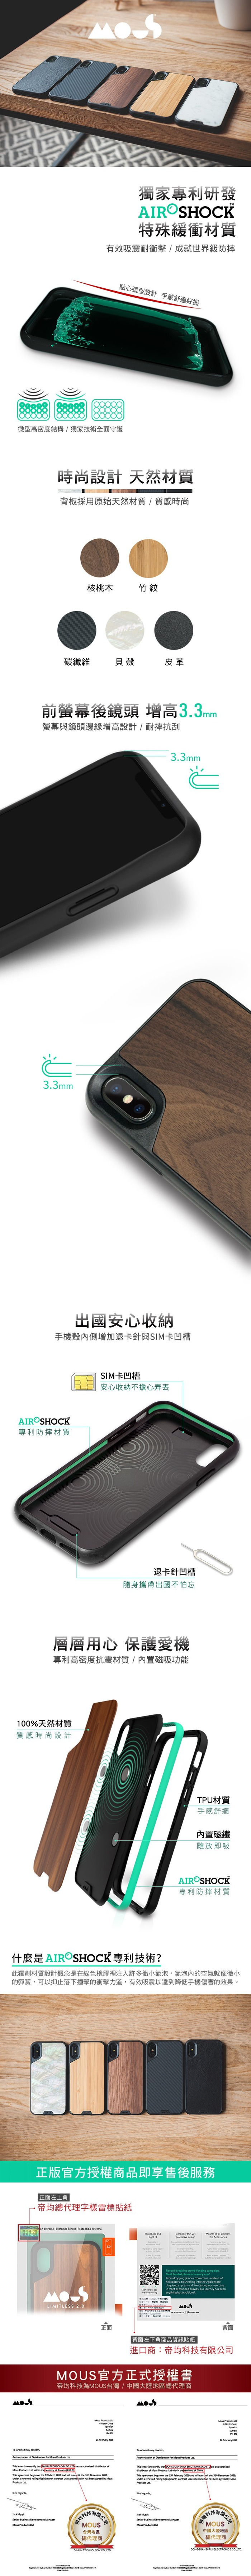 Mous|iPhone Limitless 2.0 天然材質防摔保護殼-竹紋/核桃木/皮革 (iPhone X/Xs/XR/Xs Max)